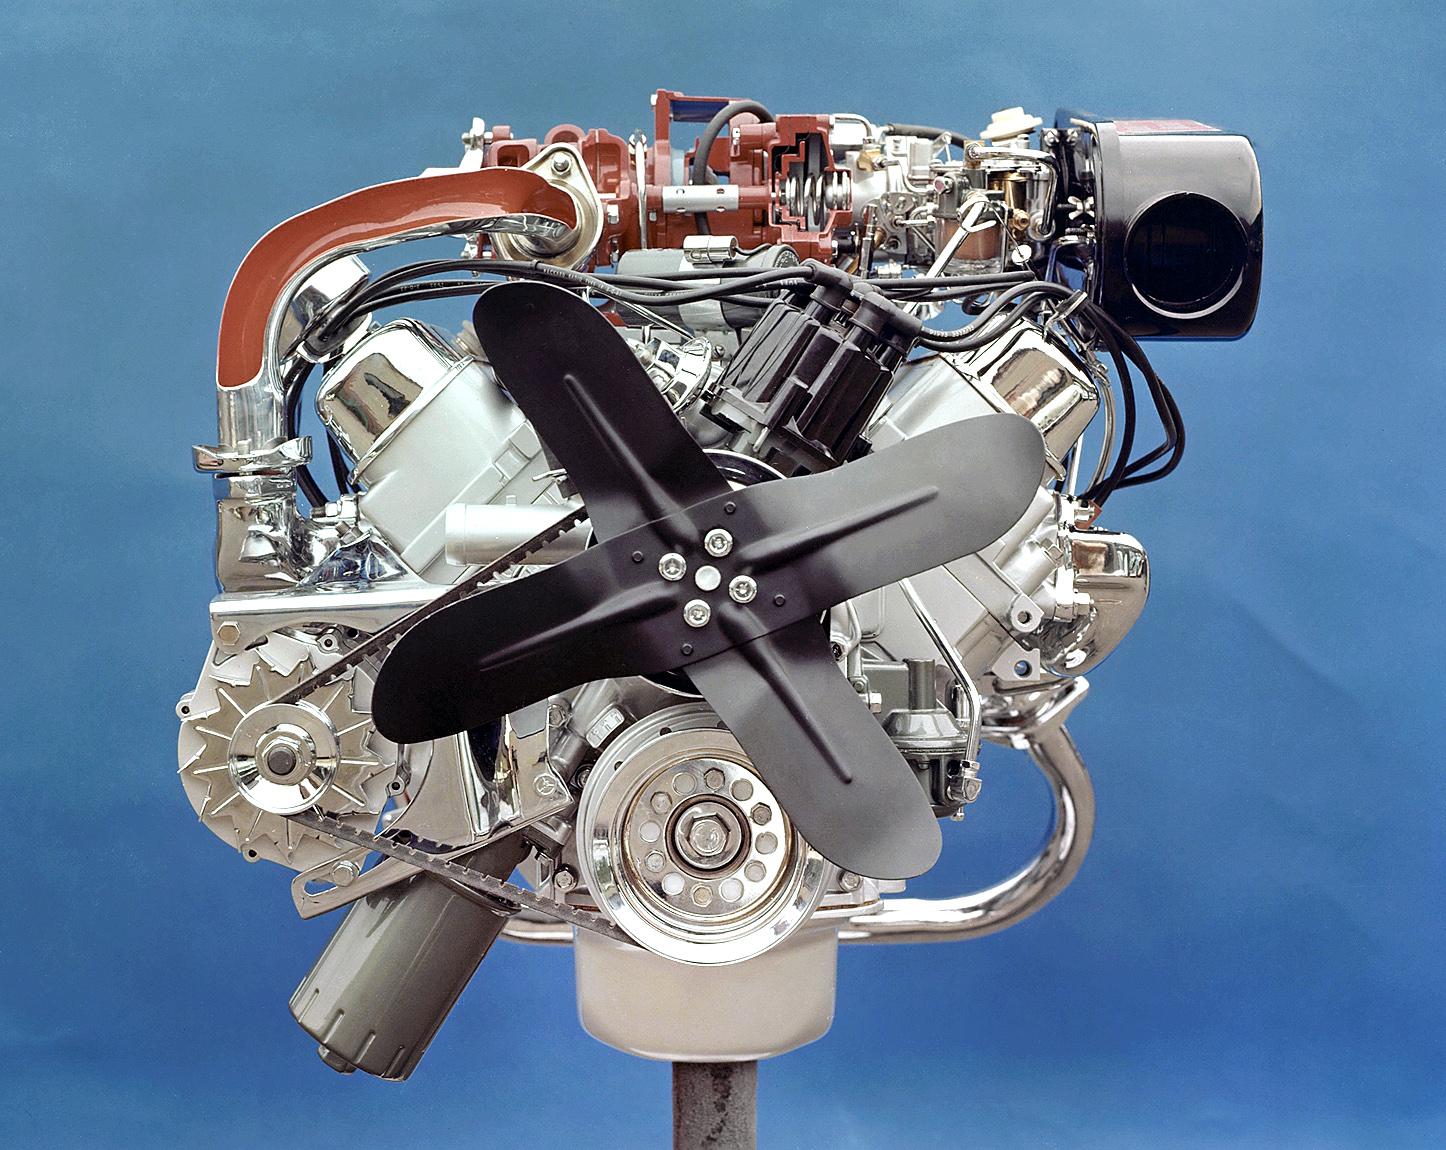 oldmobile rocket v8 turbo jetfire